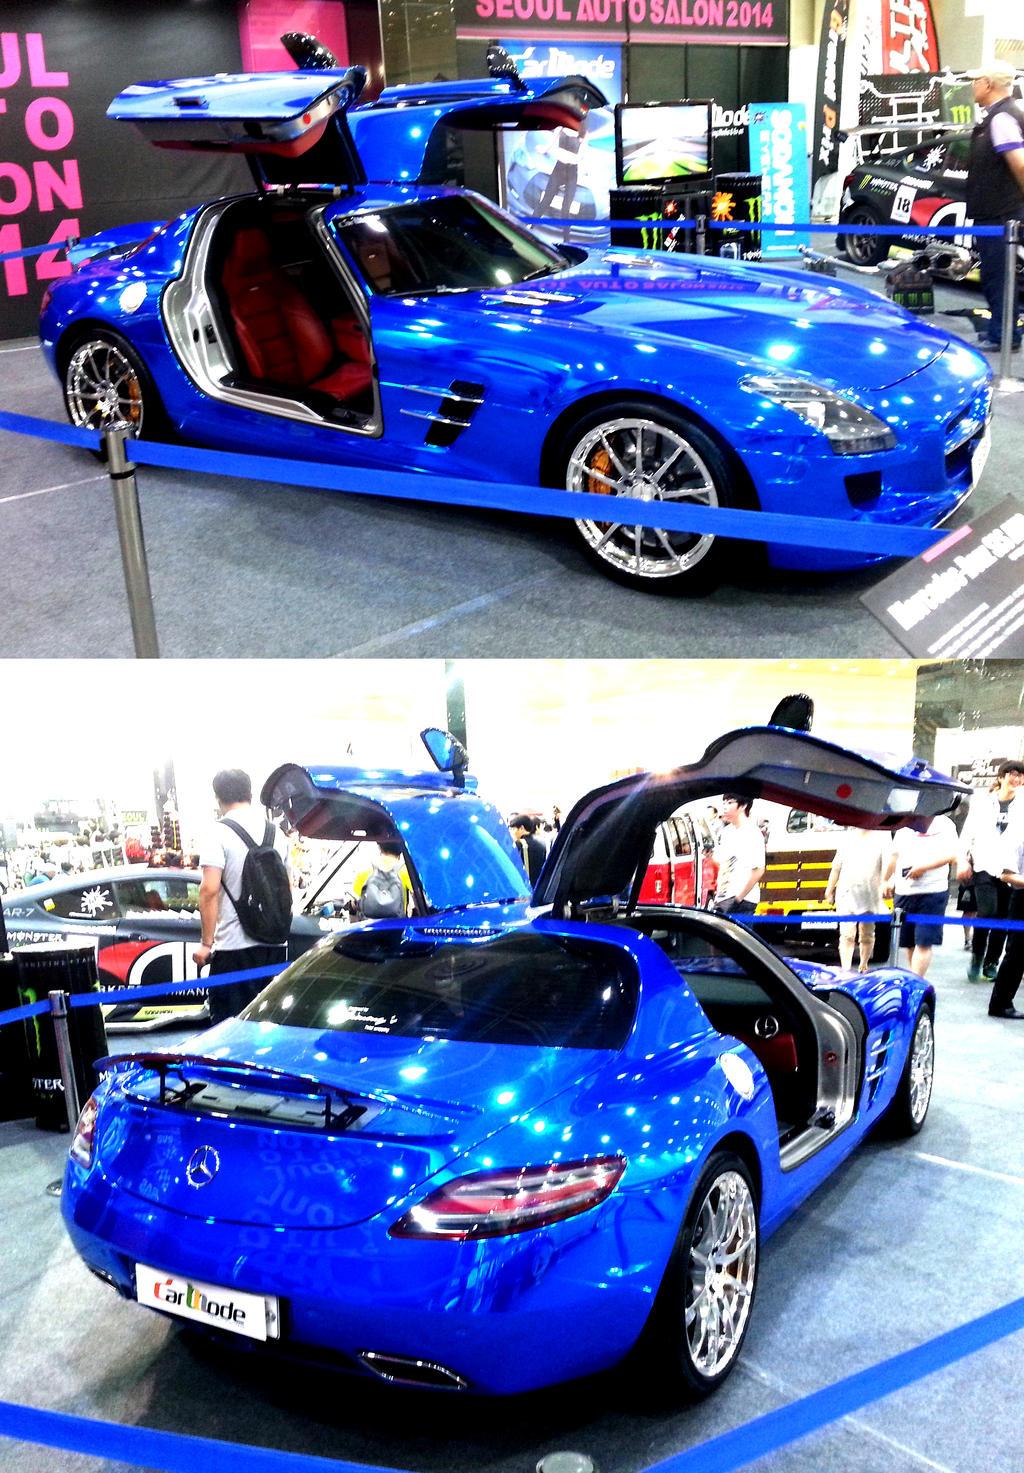 Metallic Custom Blue SLS AMG by toyonda